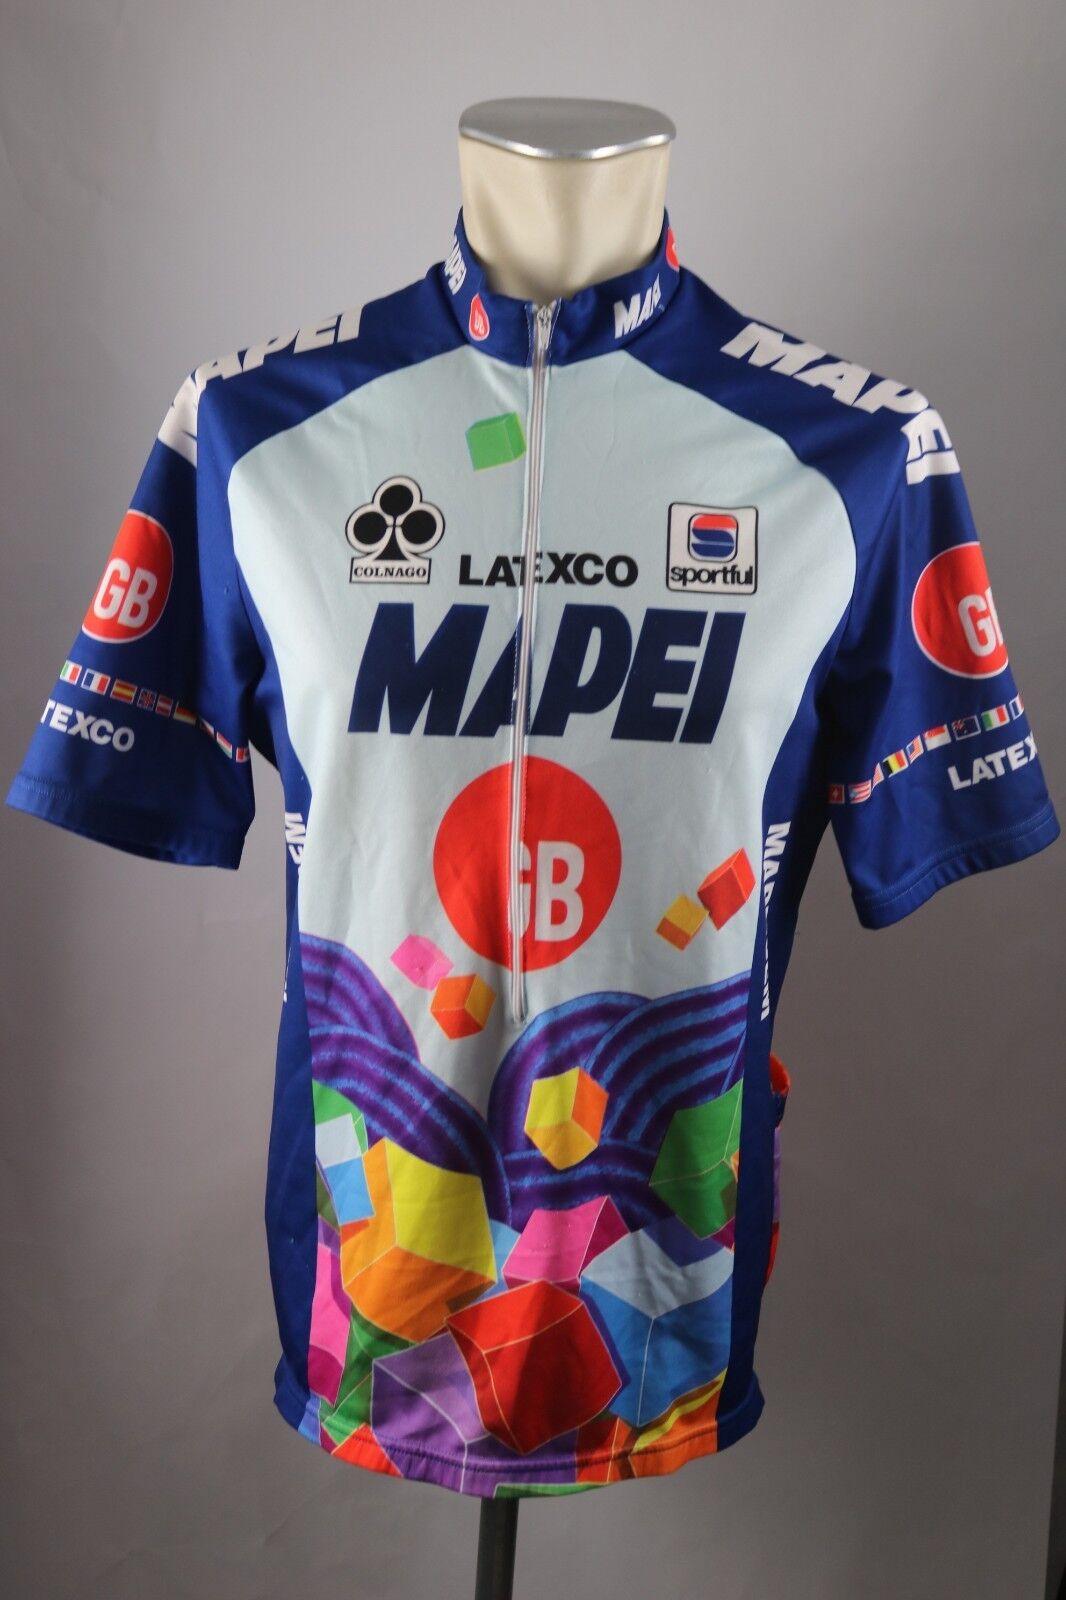 Colnago  Latexco Mapei GB Team Trikot ca. L -  XL BW 56cm Bike cycling jersey S5  exclusive designs